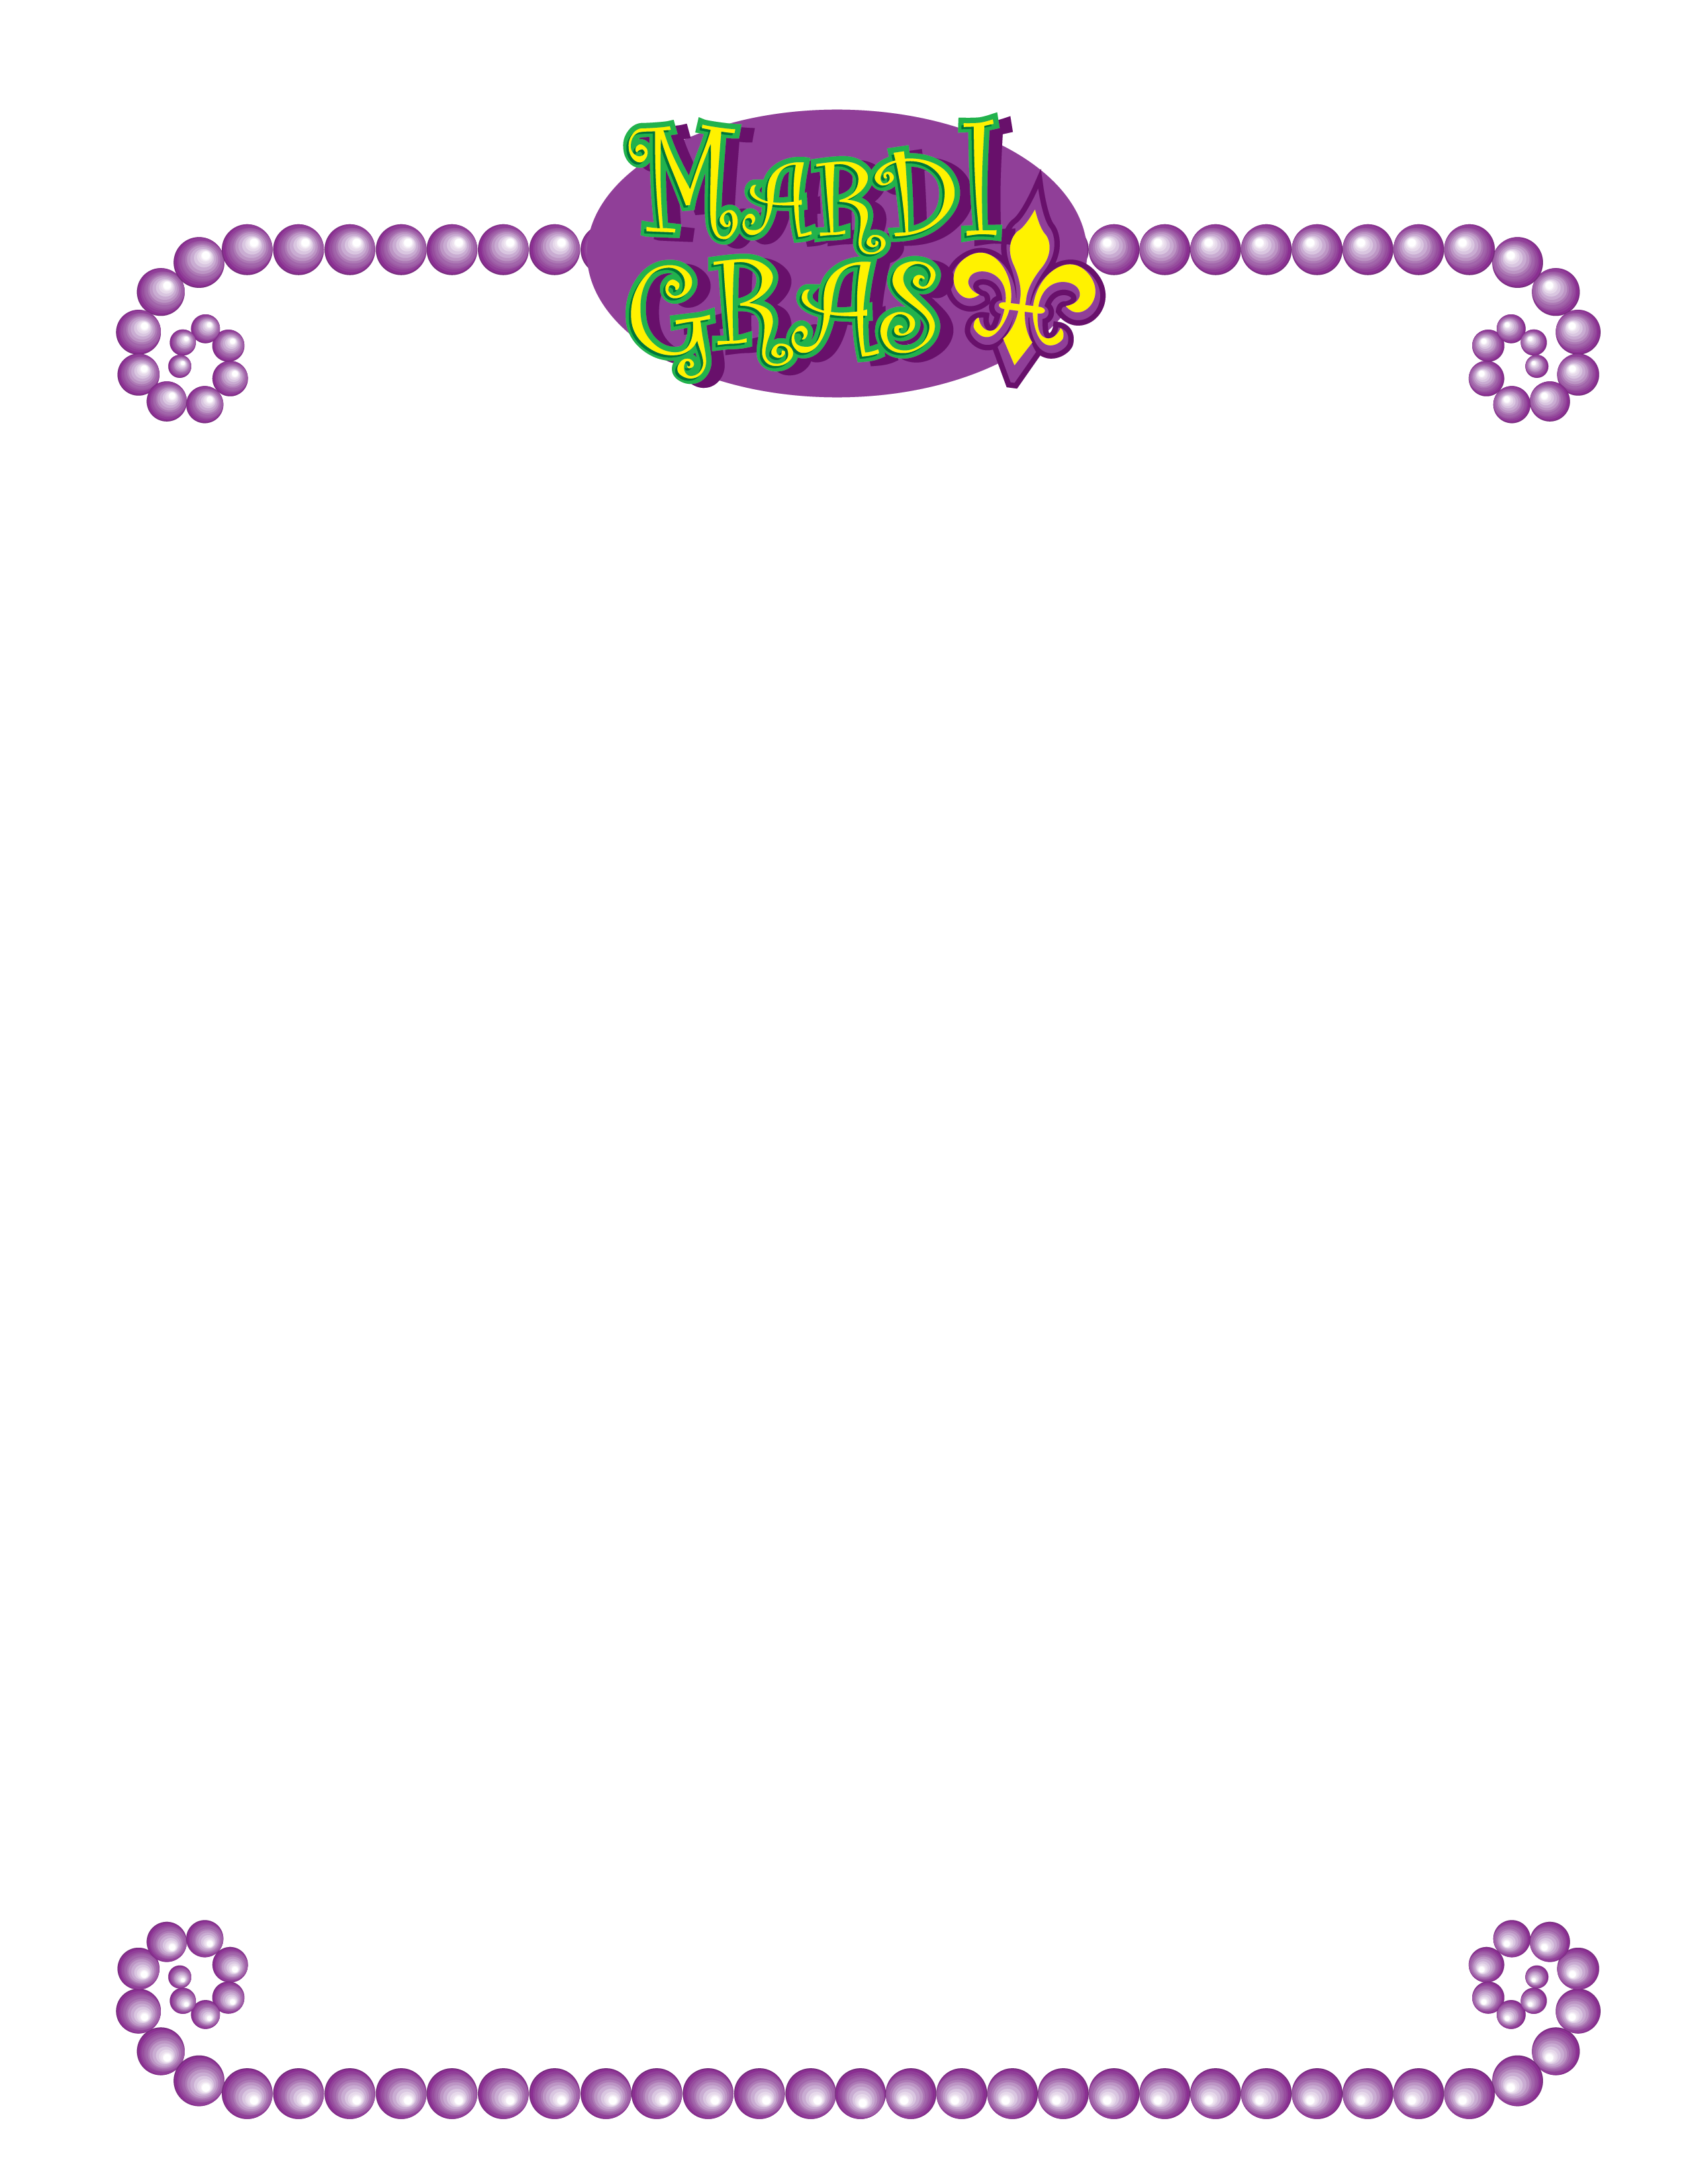 Mardi gras border clipart clipart black and white download Mardi Gras Stationery Clip Art - New Orleans Free Vector ... clipart black and white download